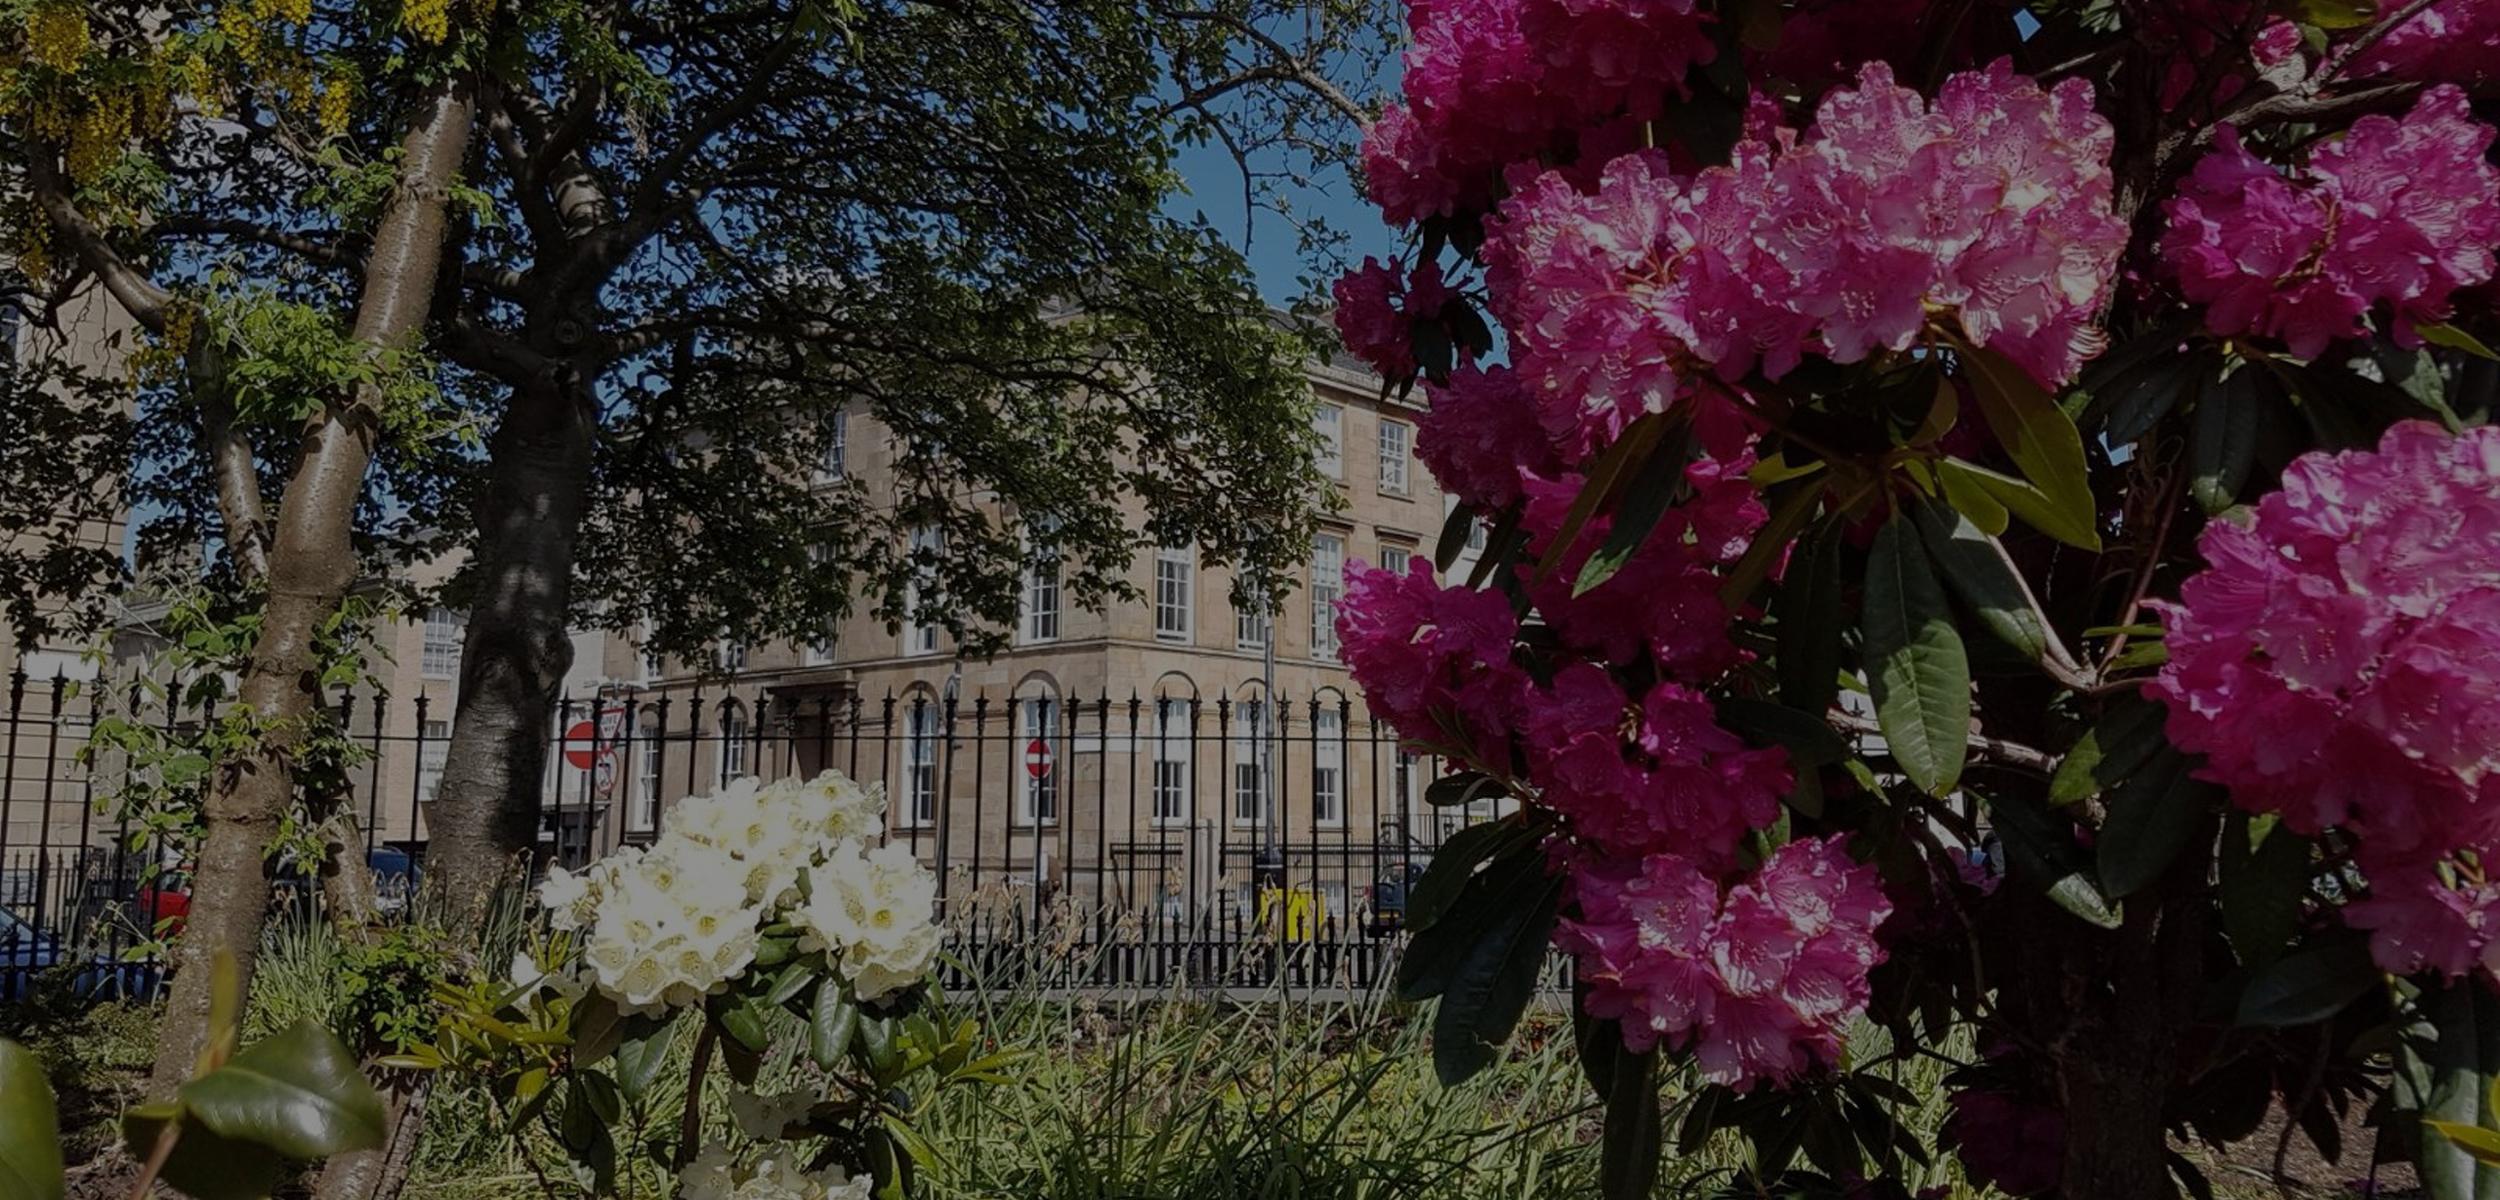 Blythswood Square Gardens